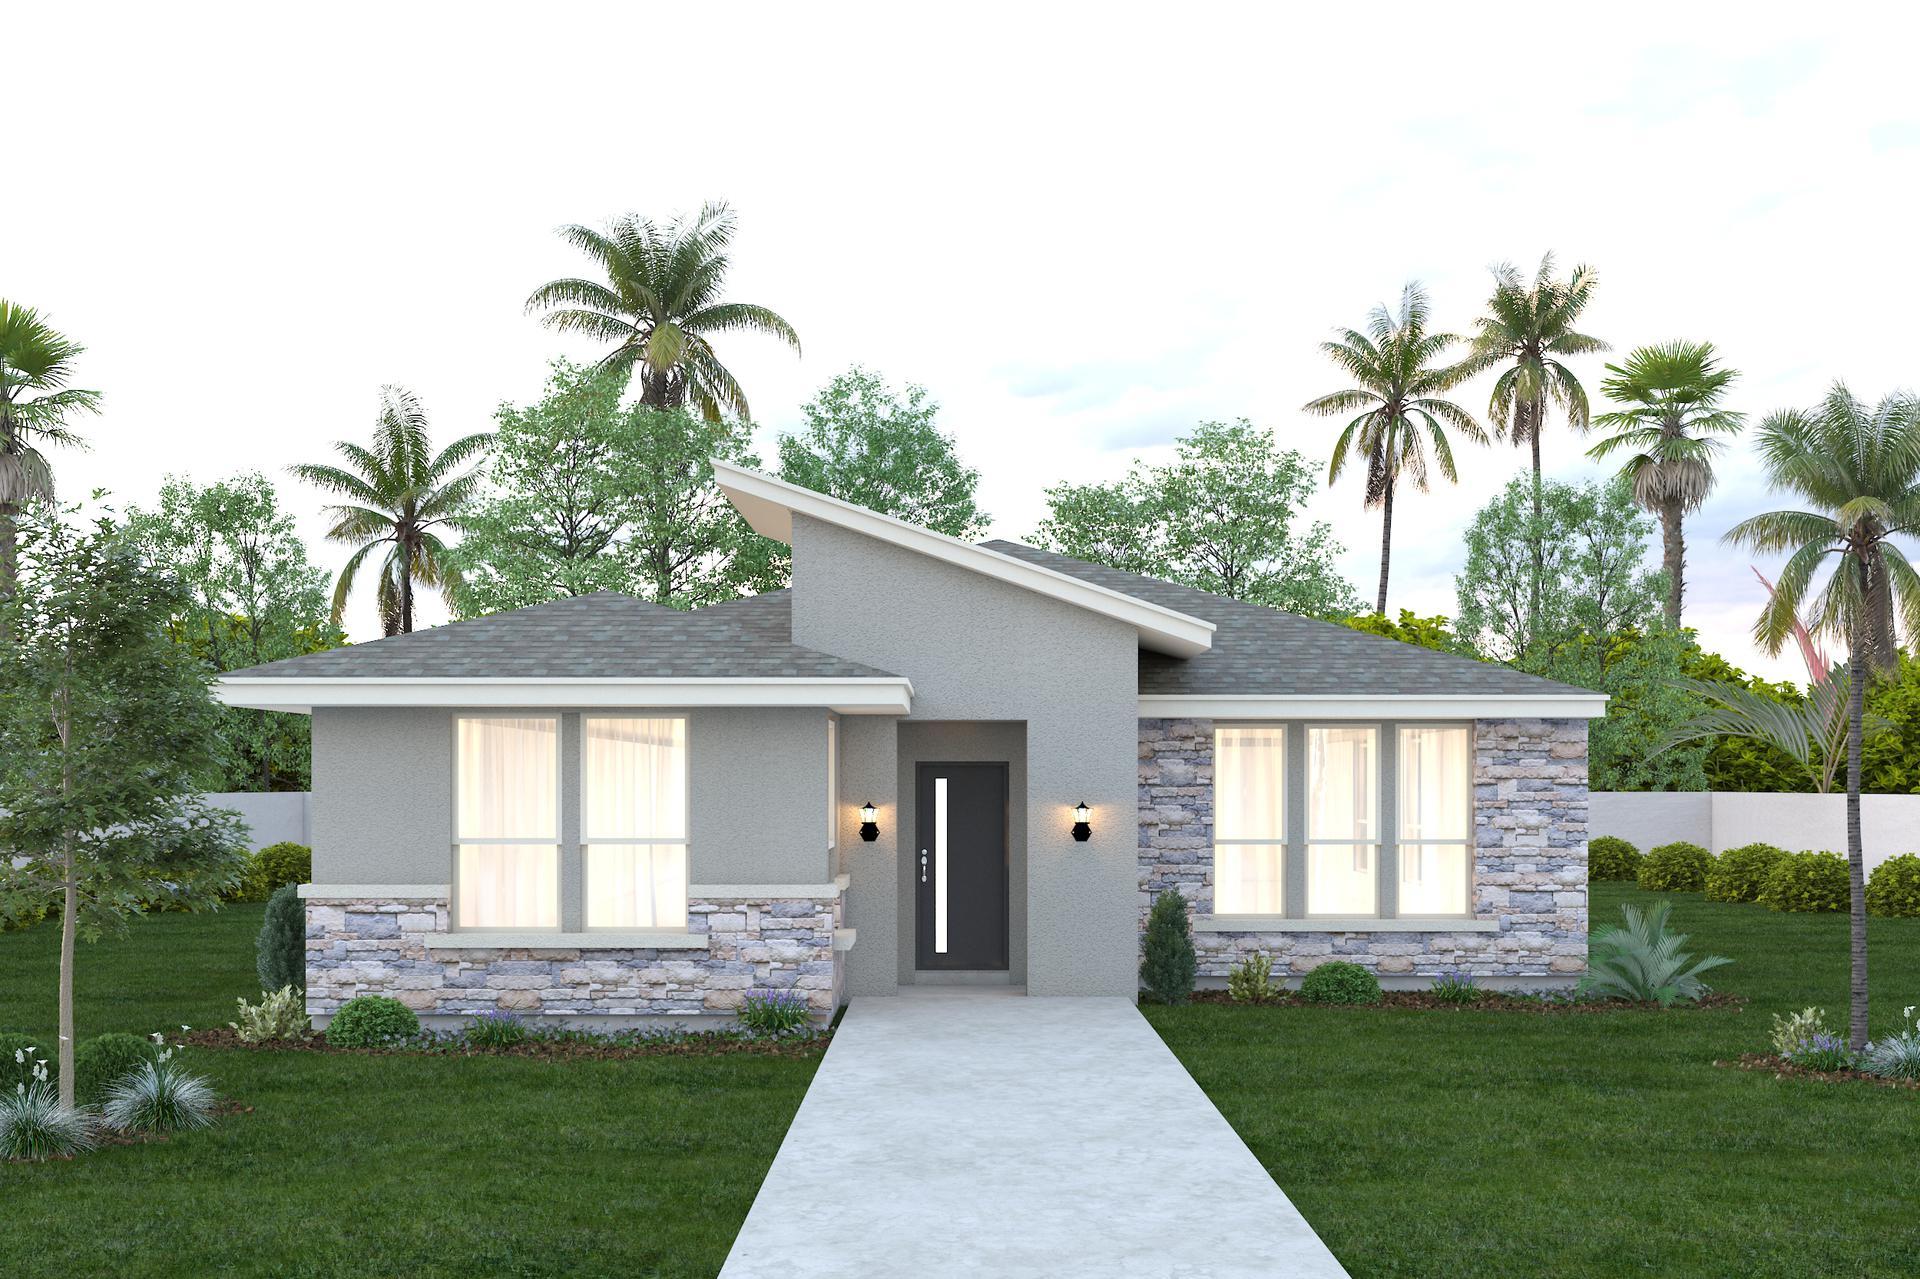 The Santa Cruz new home in Mission , TX